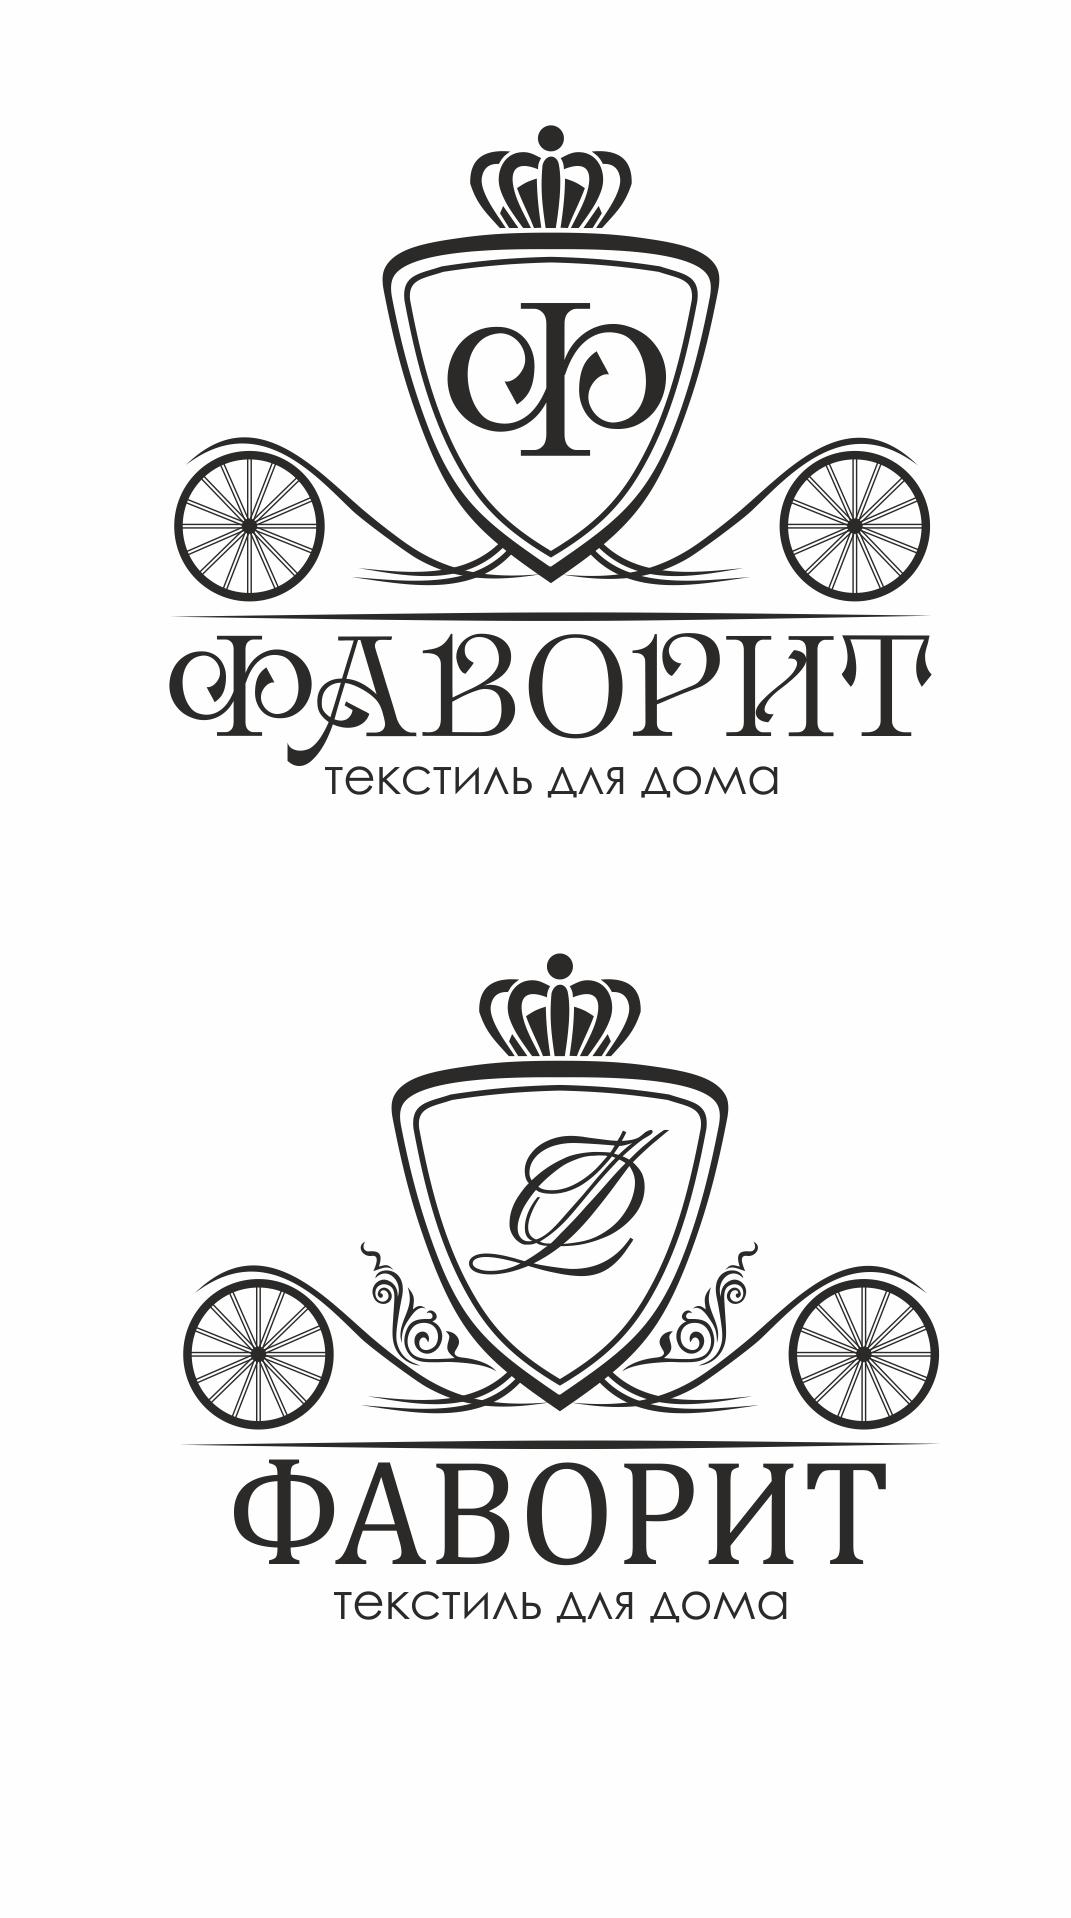 Разработать логотип для нового бренда фото f_75159e9ff2a52a90.jpg